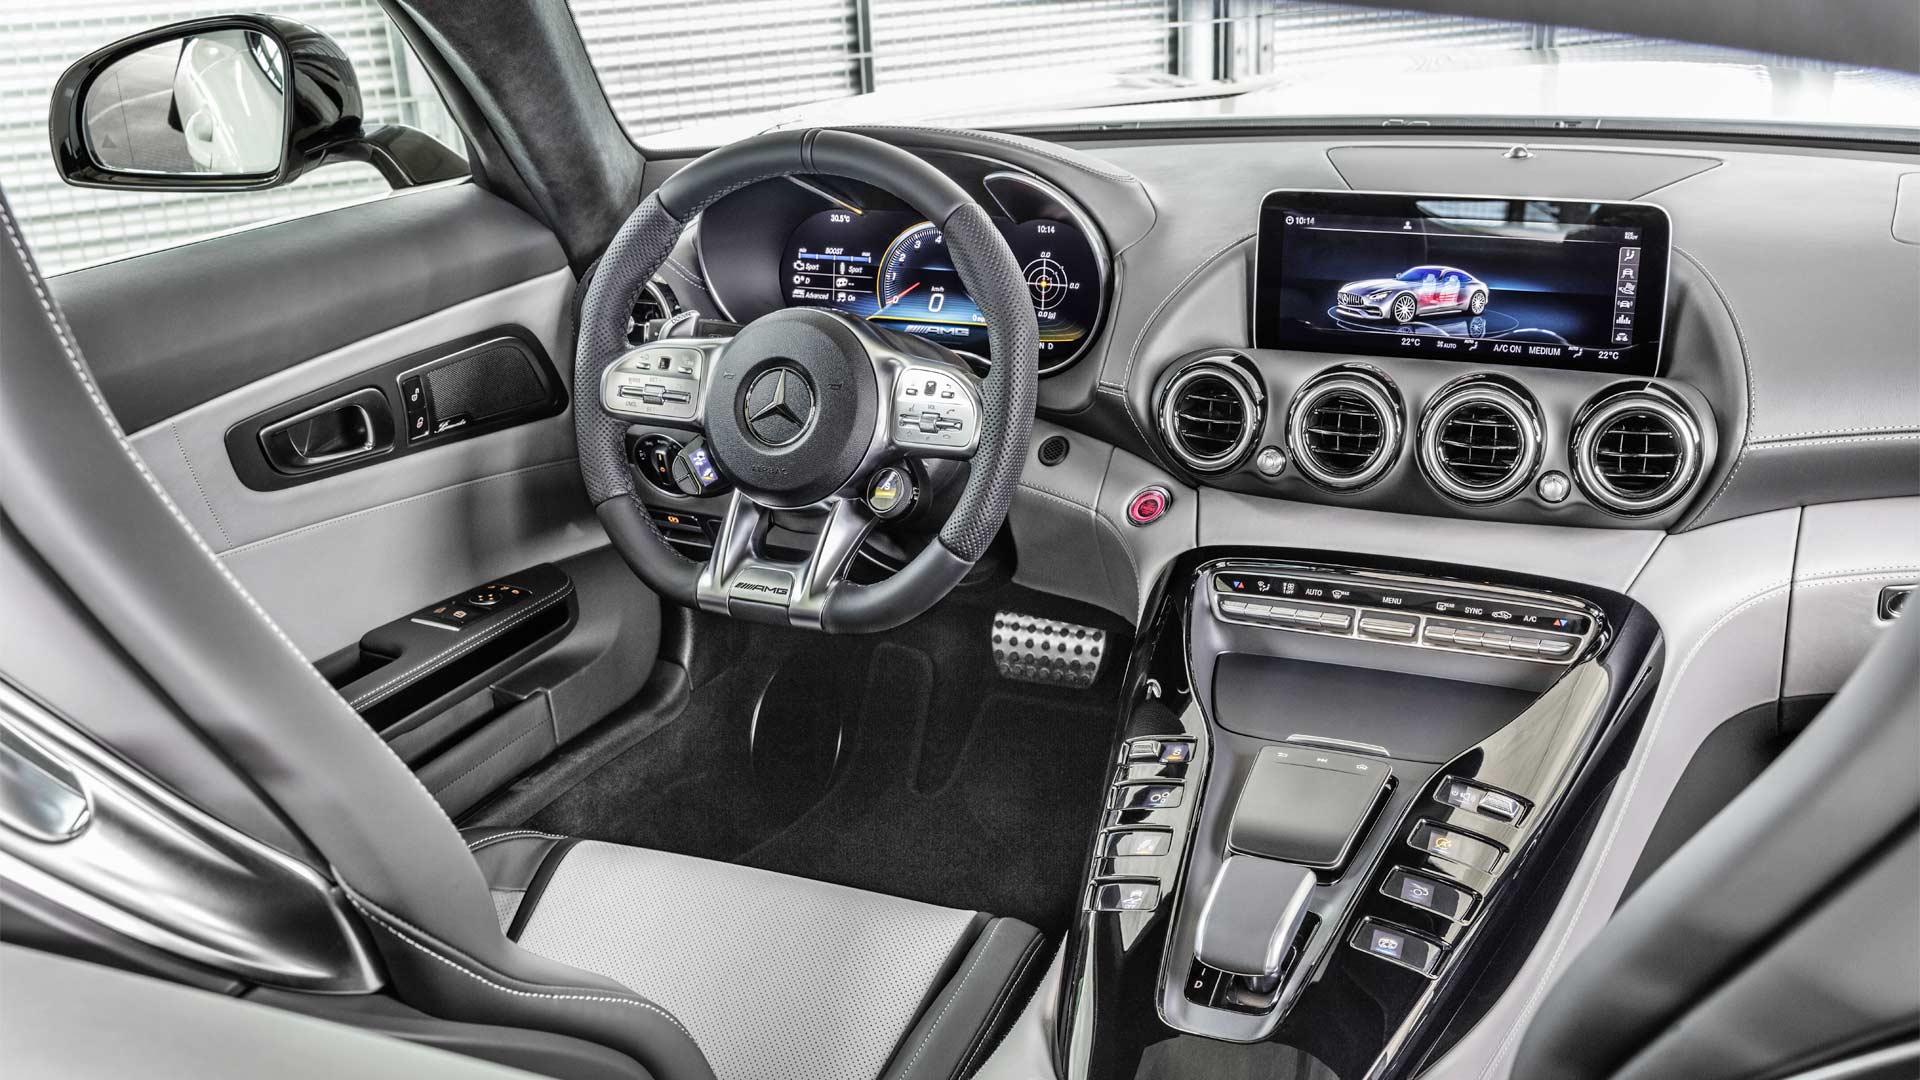 2019-Mercedes-AMG-GT-Interior-designo-diamond-white